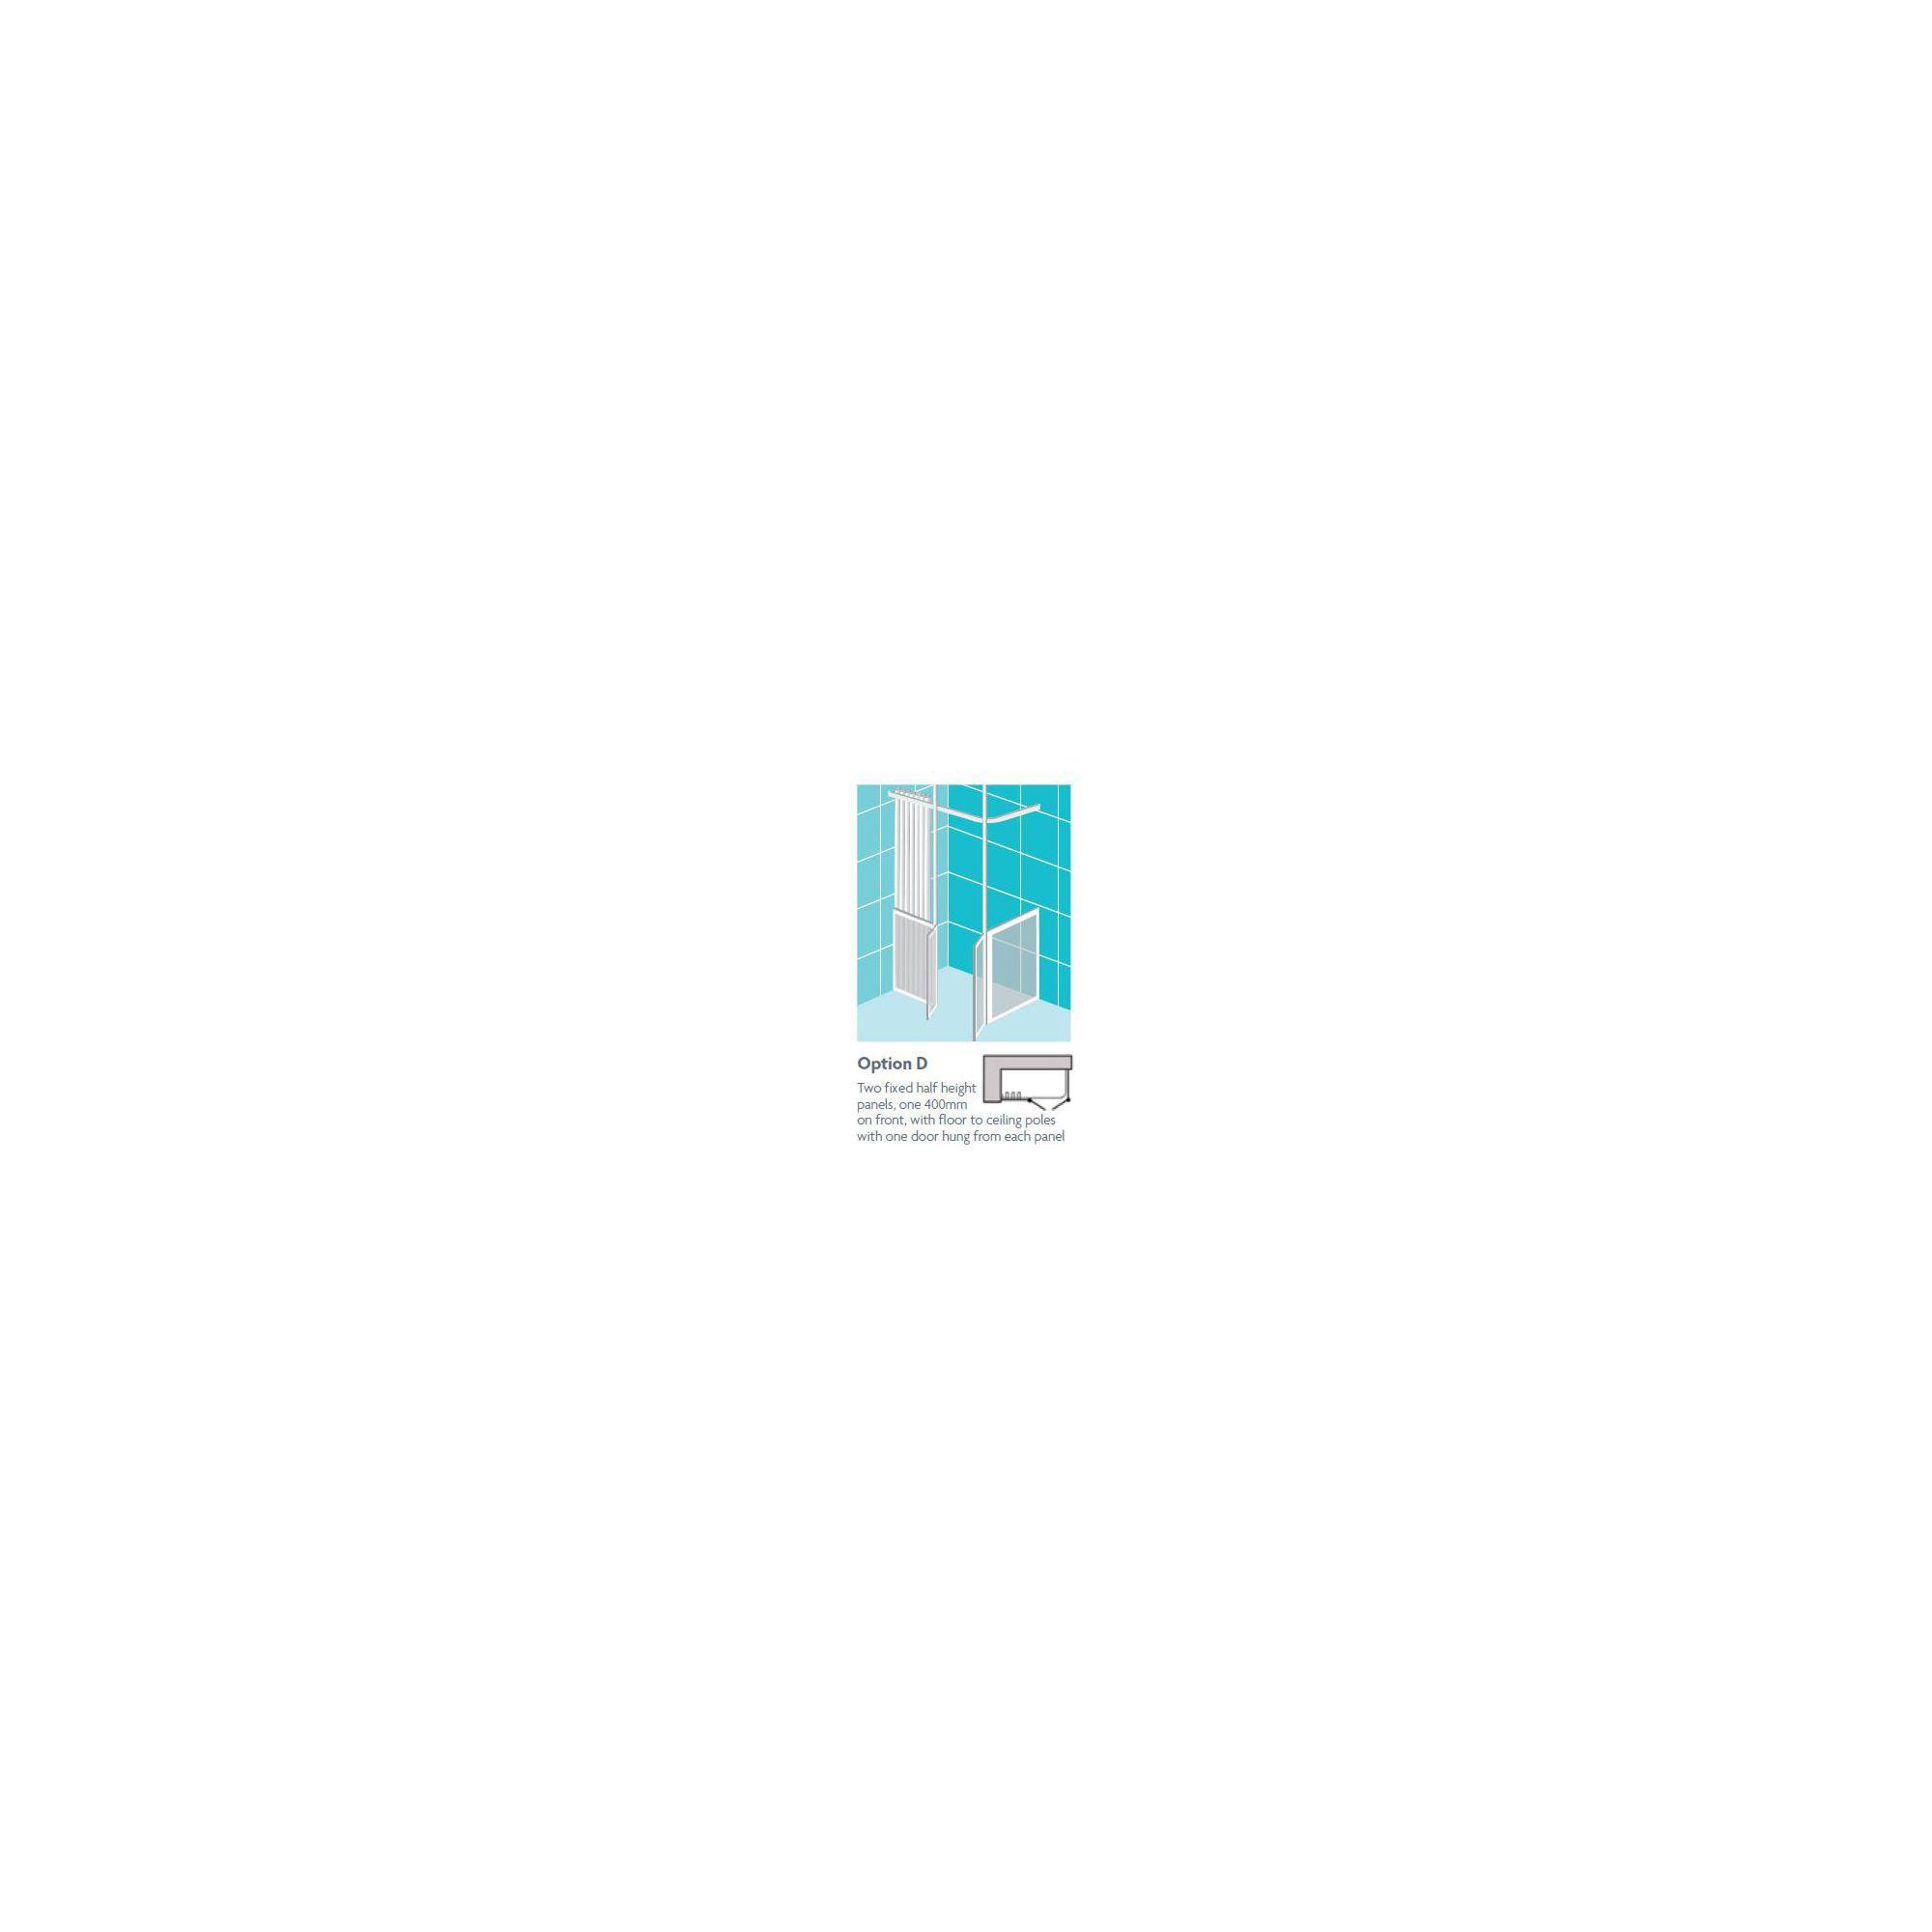 Impey Supreme Corner Door Option D Left Hand 1250mm x 710mm at Tescos Direct